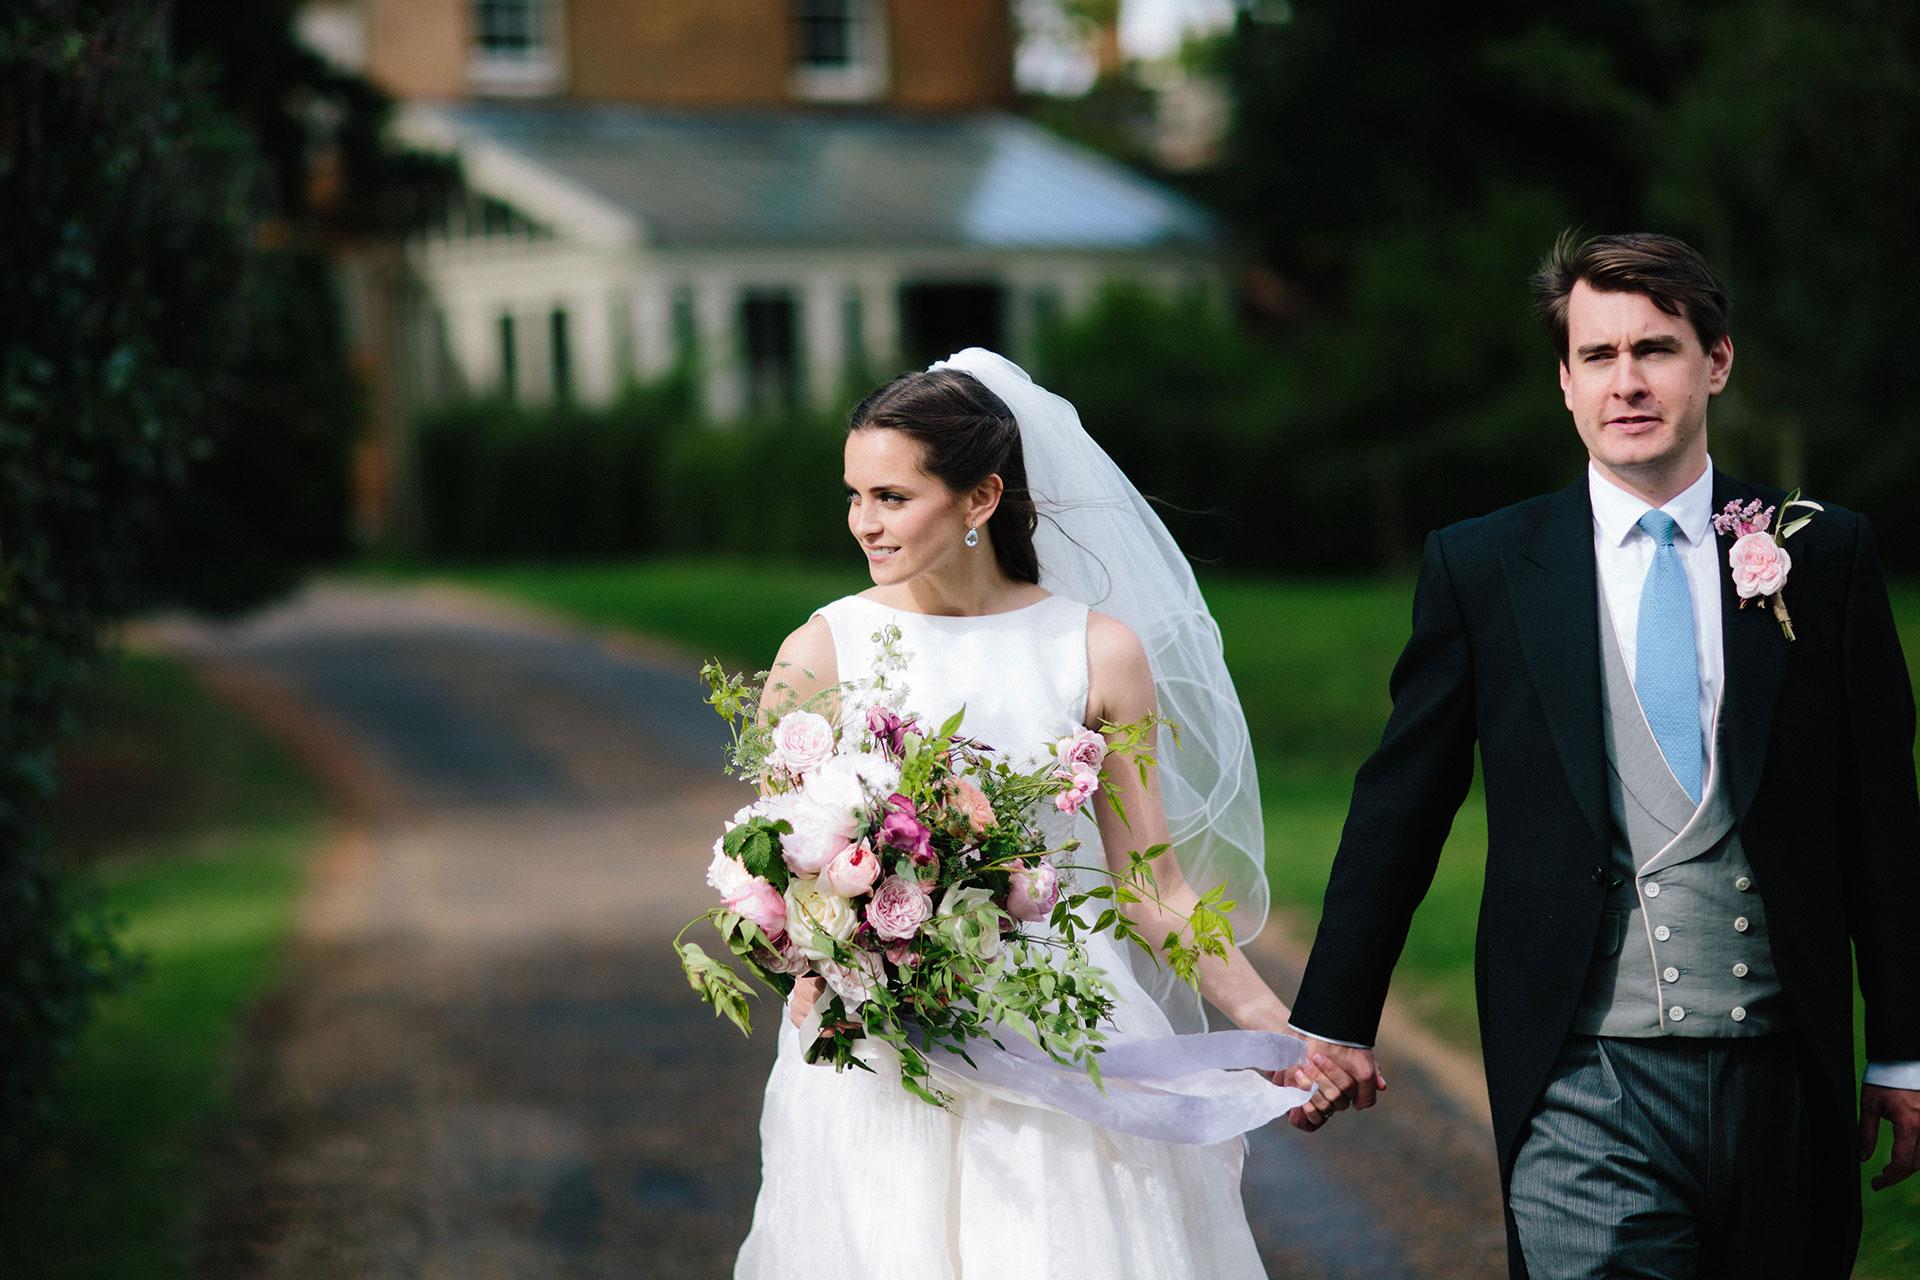 Langar-Hall-wedding-photographer-in-Nottinghamshire-Michael-Newington-Gray-57.jpg